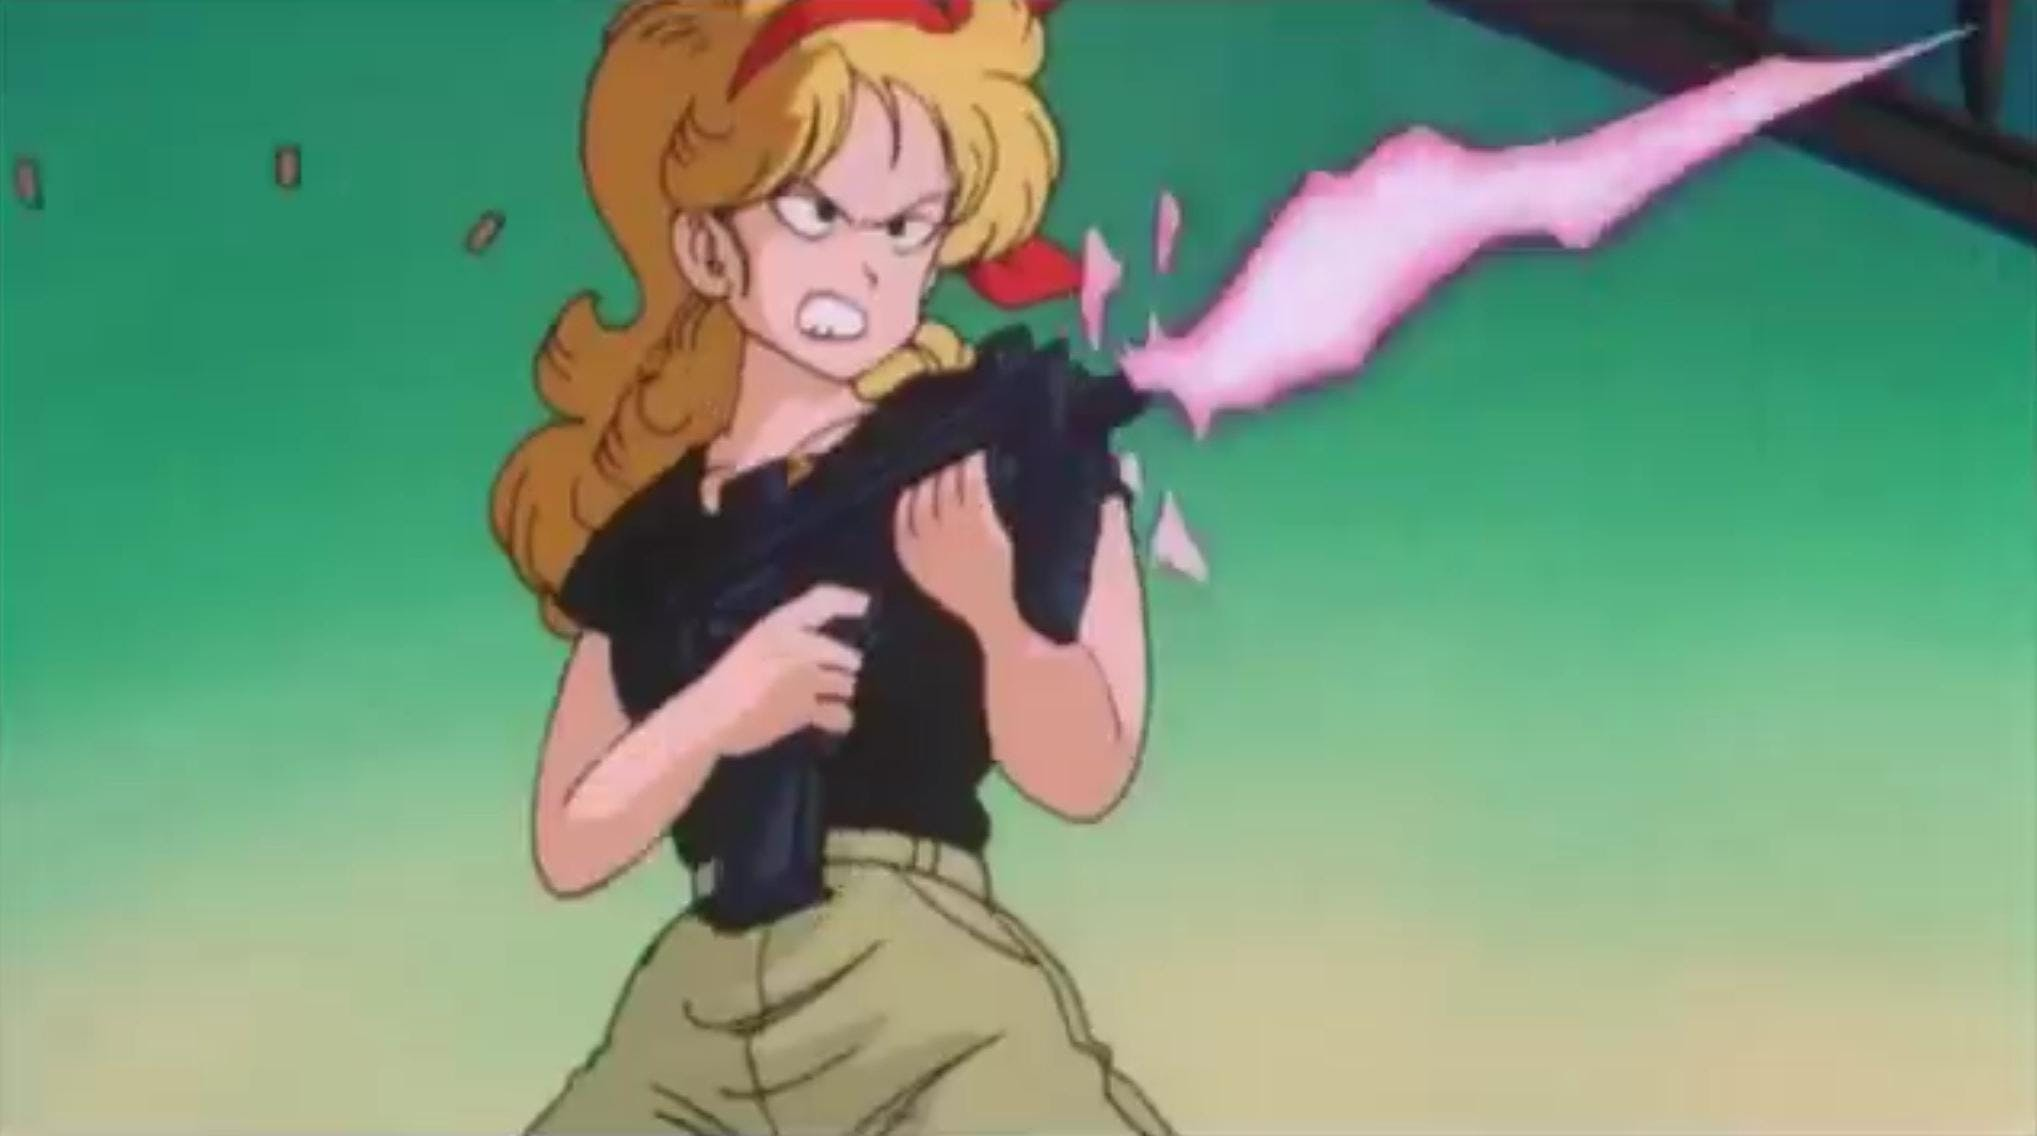 Dragon Ball Launch is one of the ladies forgotten by the mangaka Akira Toriyama...